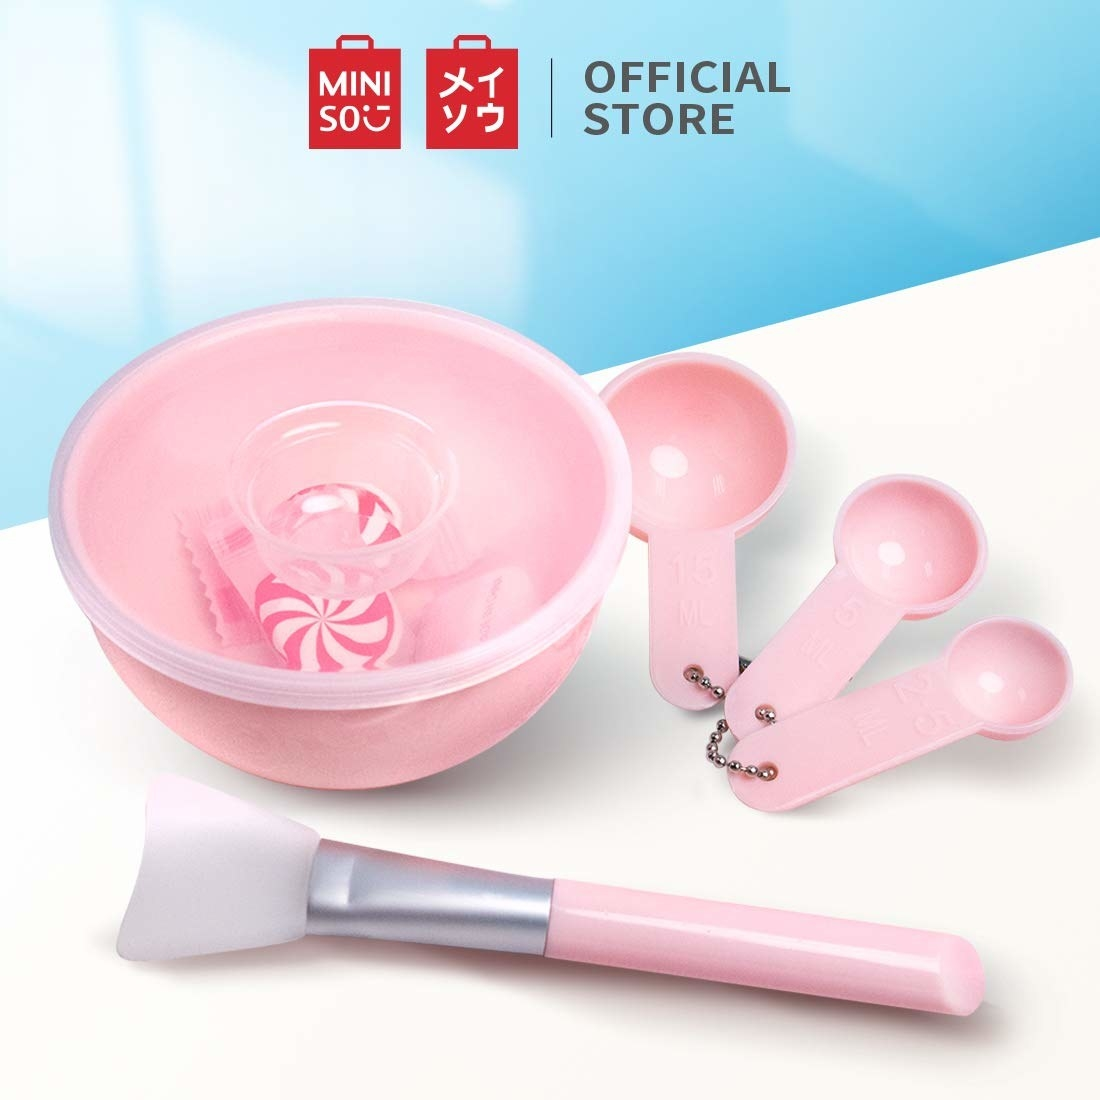 A pink facemask application set